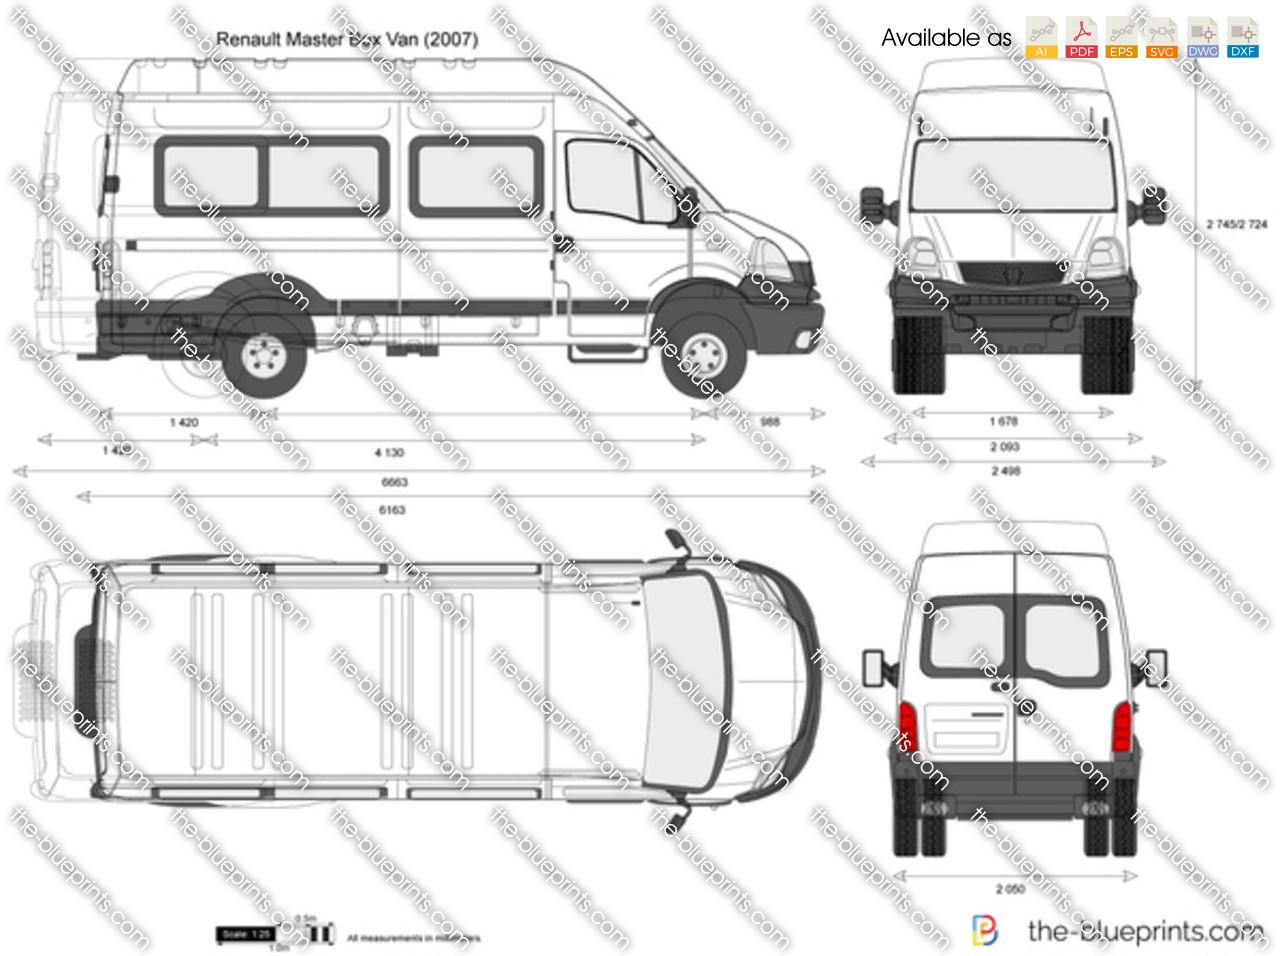 Renault Master Box Van 2009